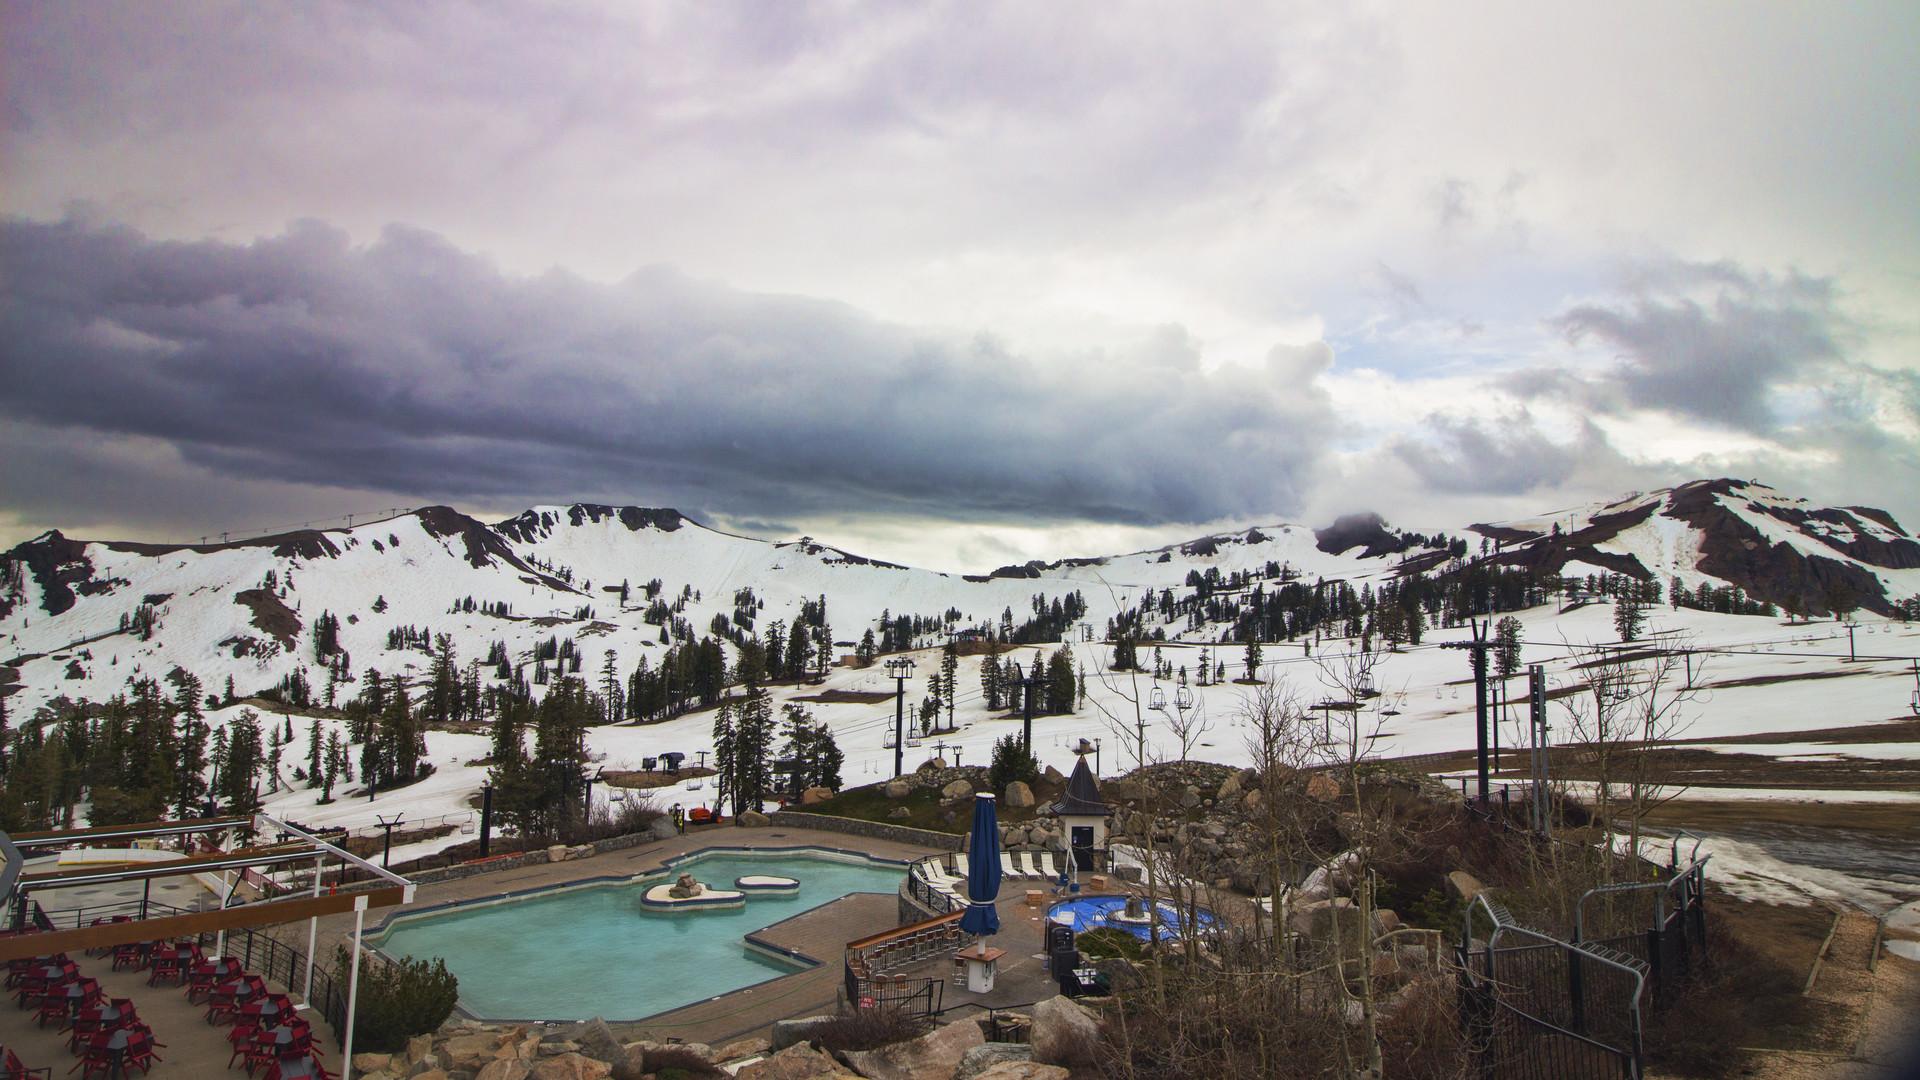 Webcam squaw valley ski resort high camp pool 2461 m - High camp swimming pool squaw valley ...